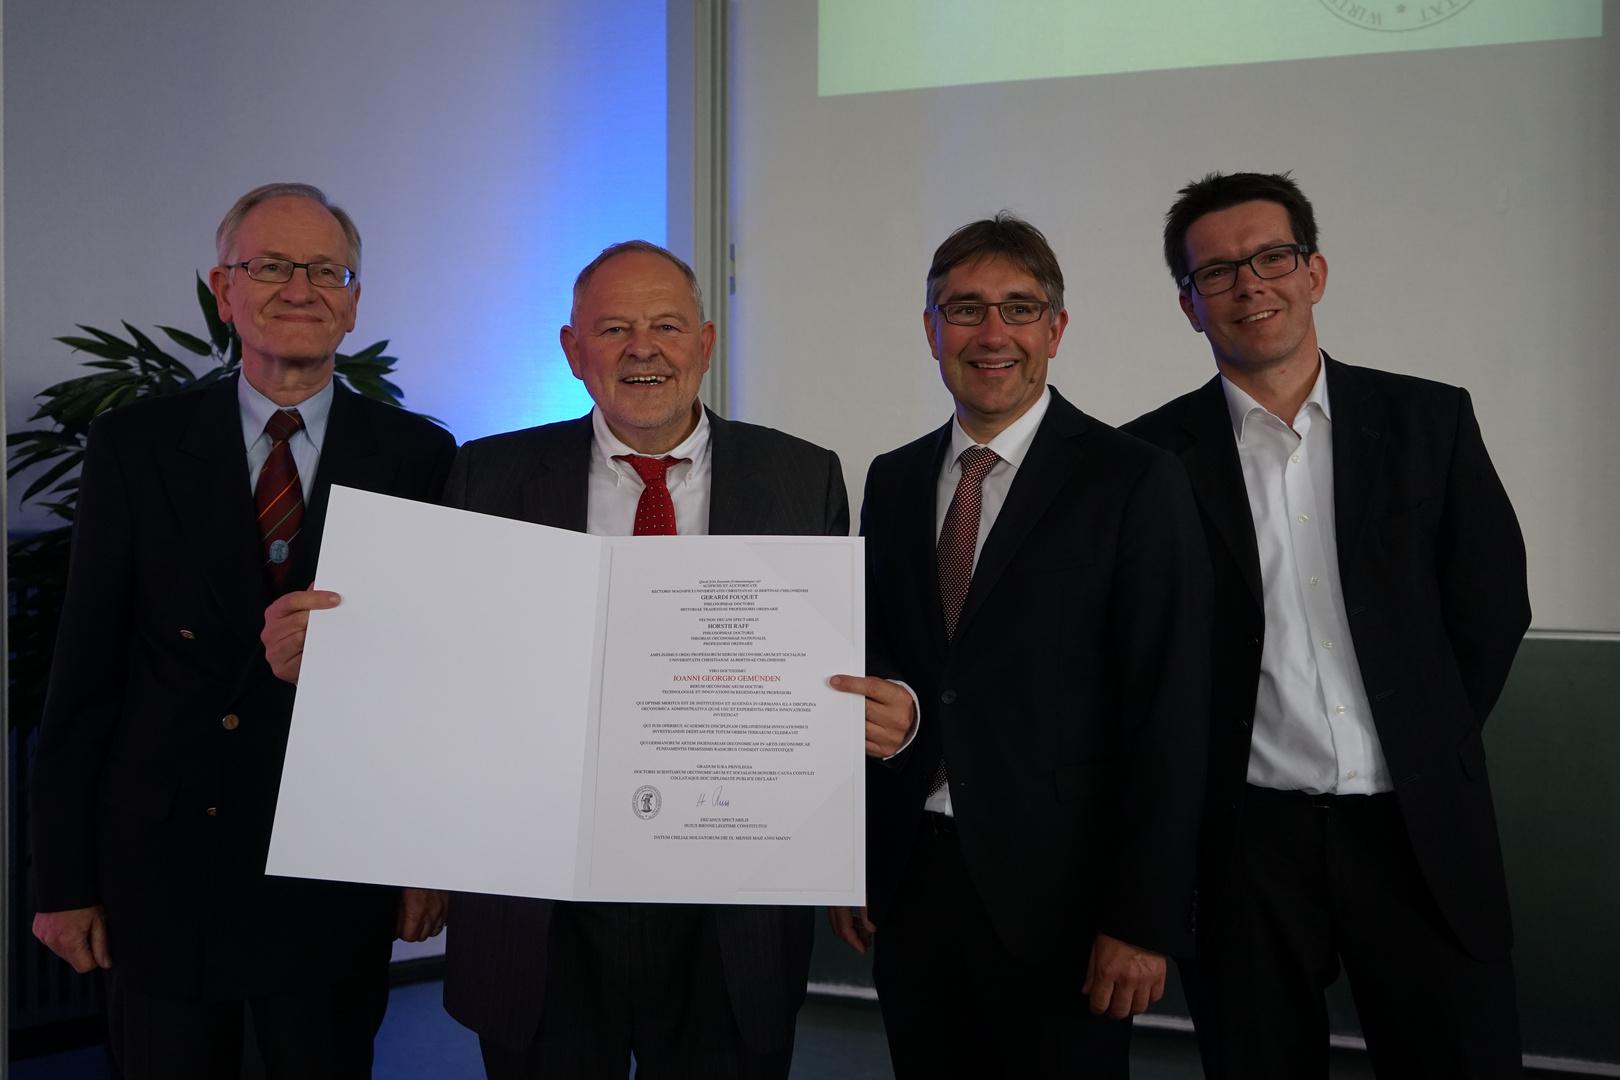 9.5.2014 Uni Kiel - meine Alma Mater - Verleihung des Ehrendoktors Dr. rer. oec. et soc. h.c.